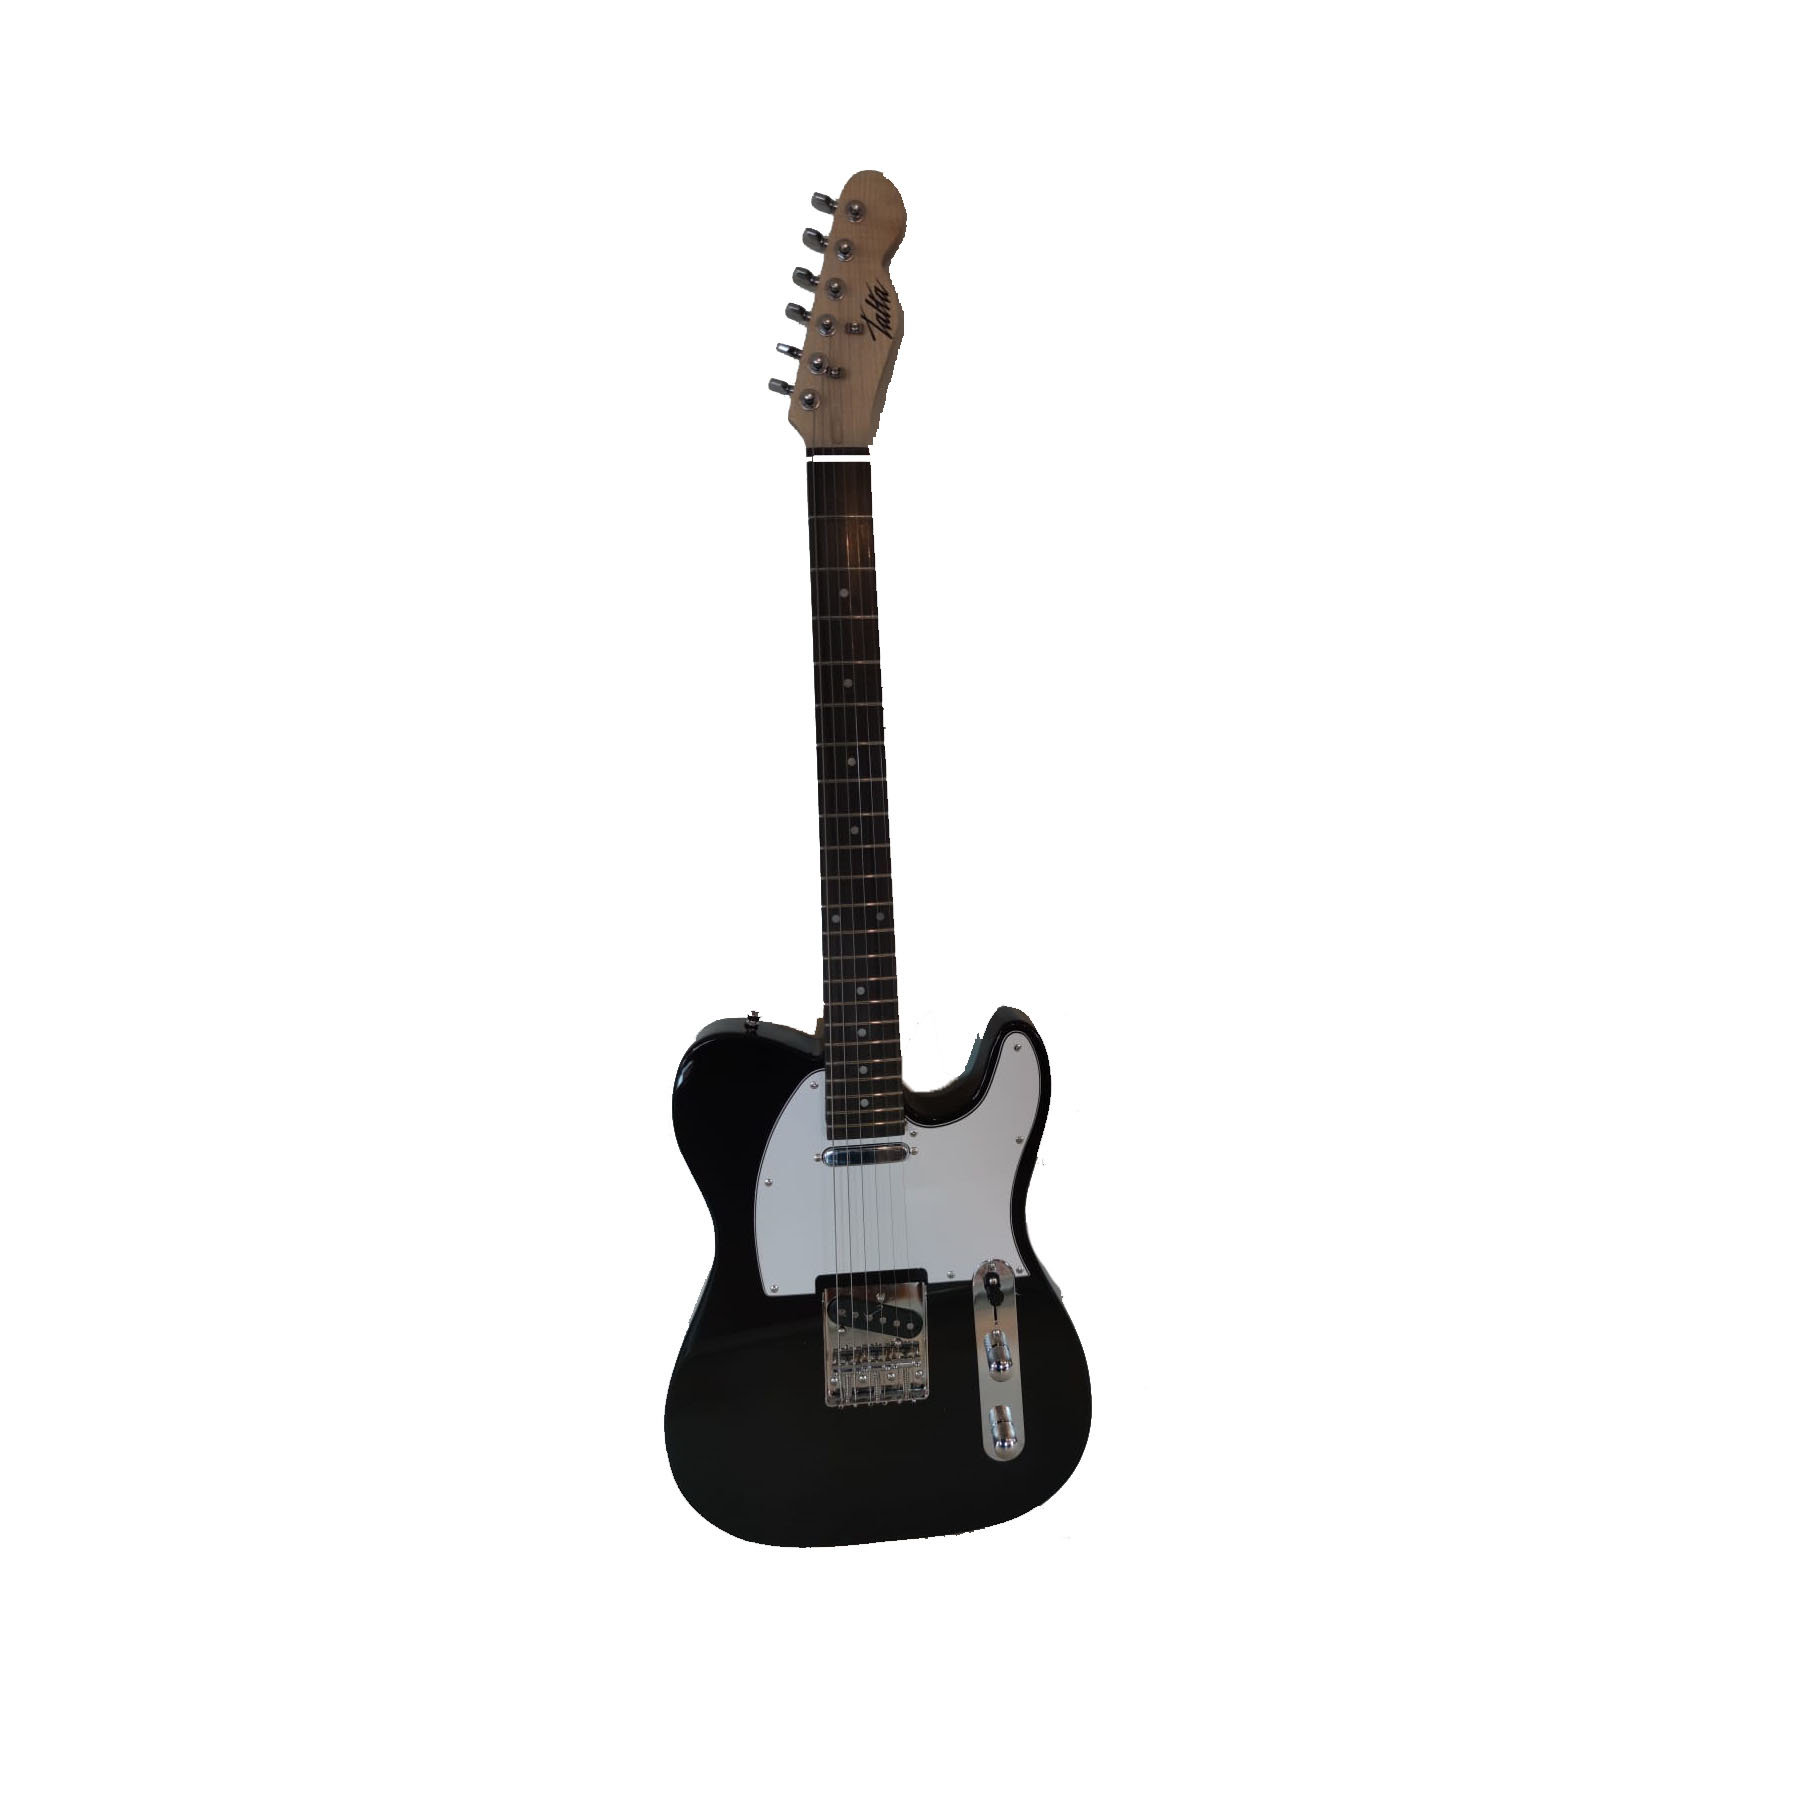 STL211 - Çift Humbucker Elektro Gitar (Siyah)